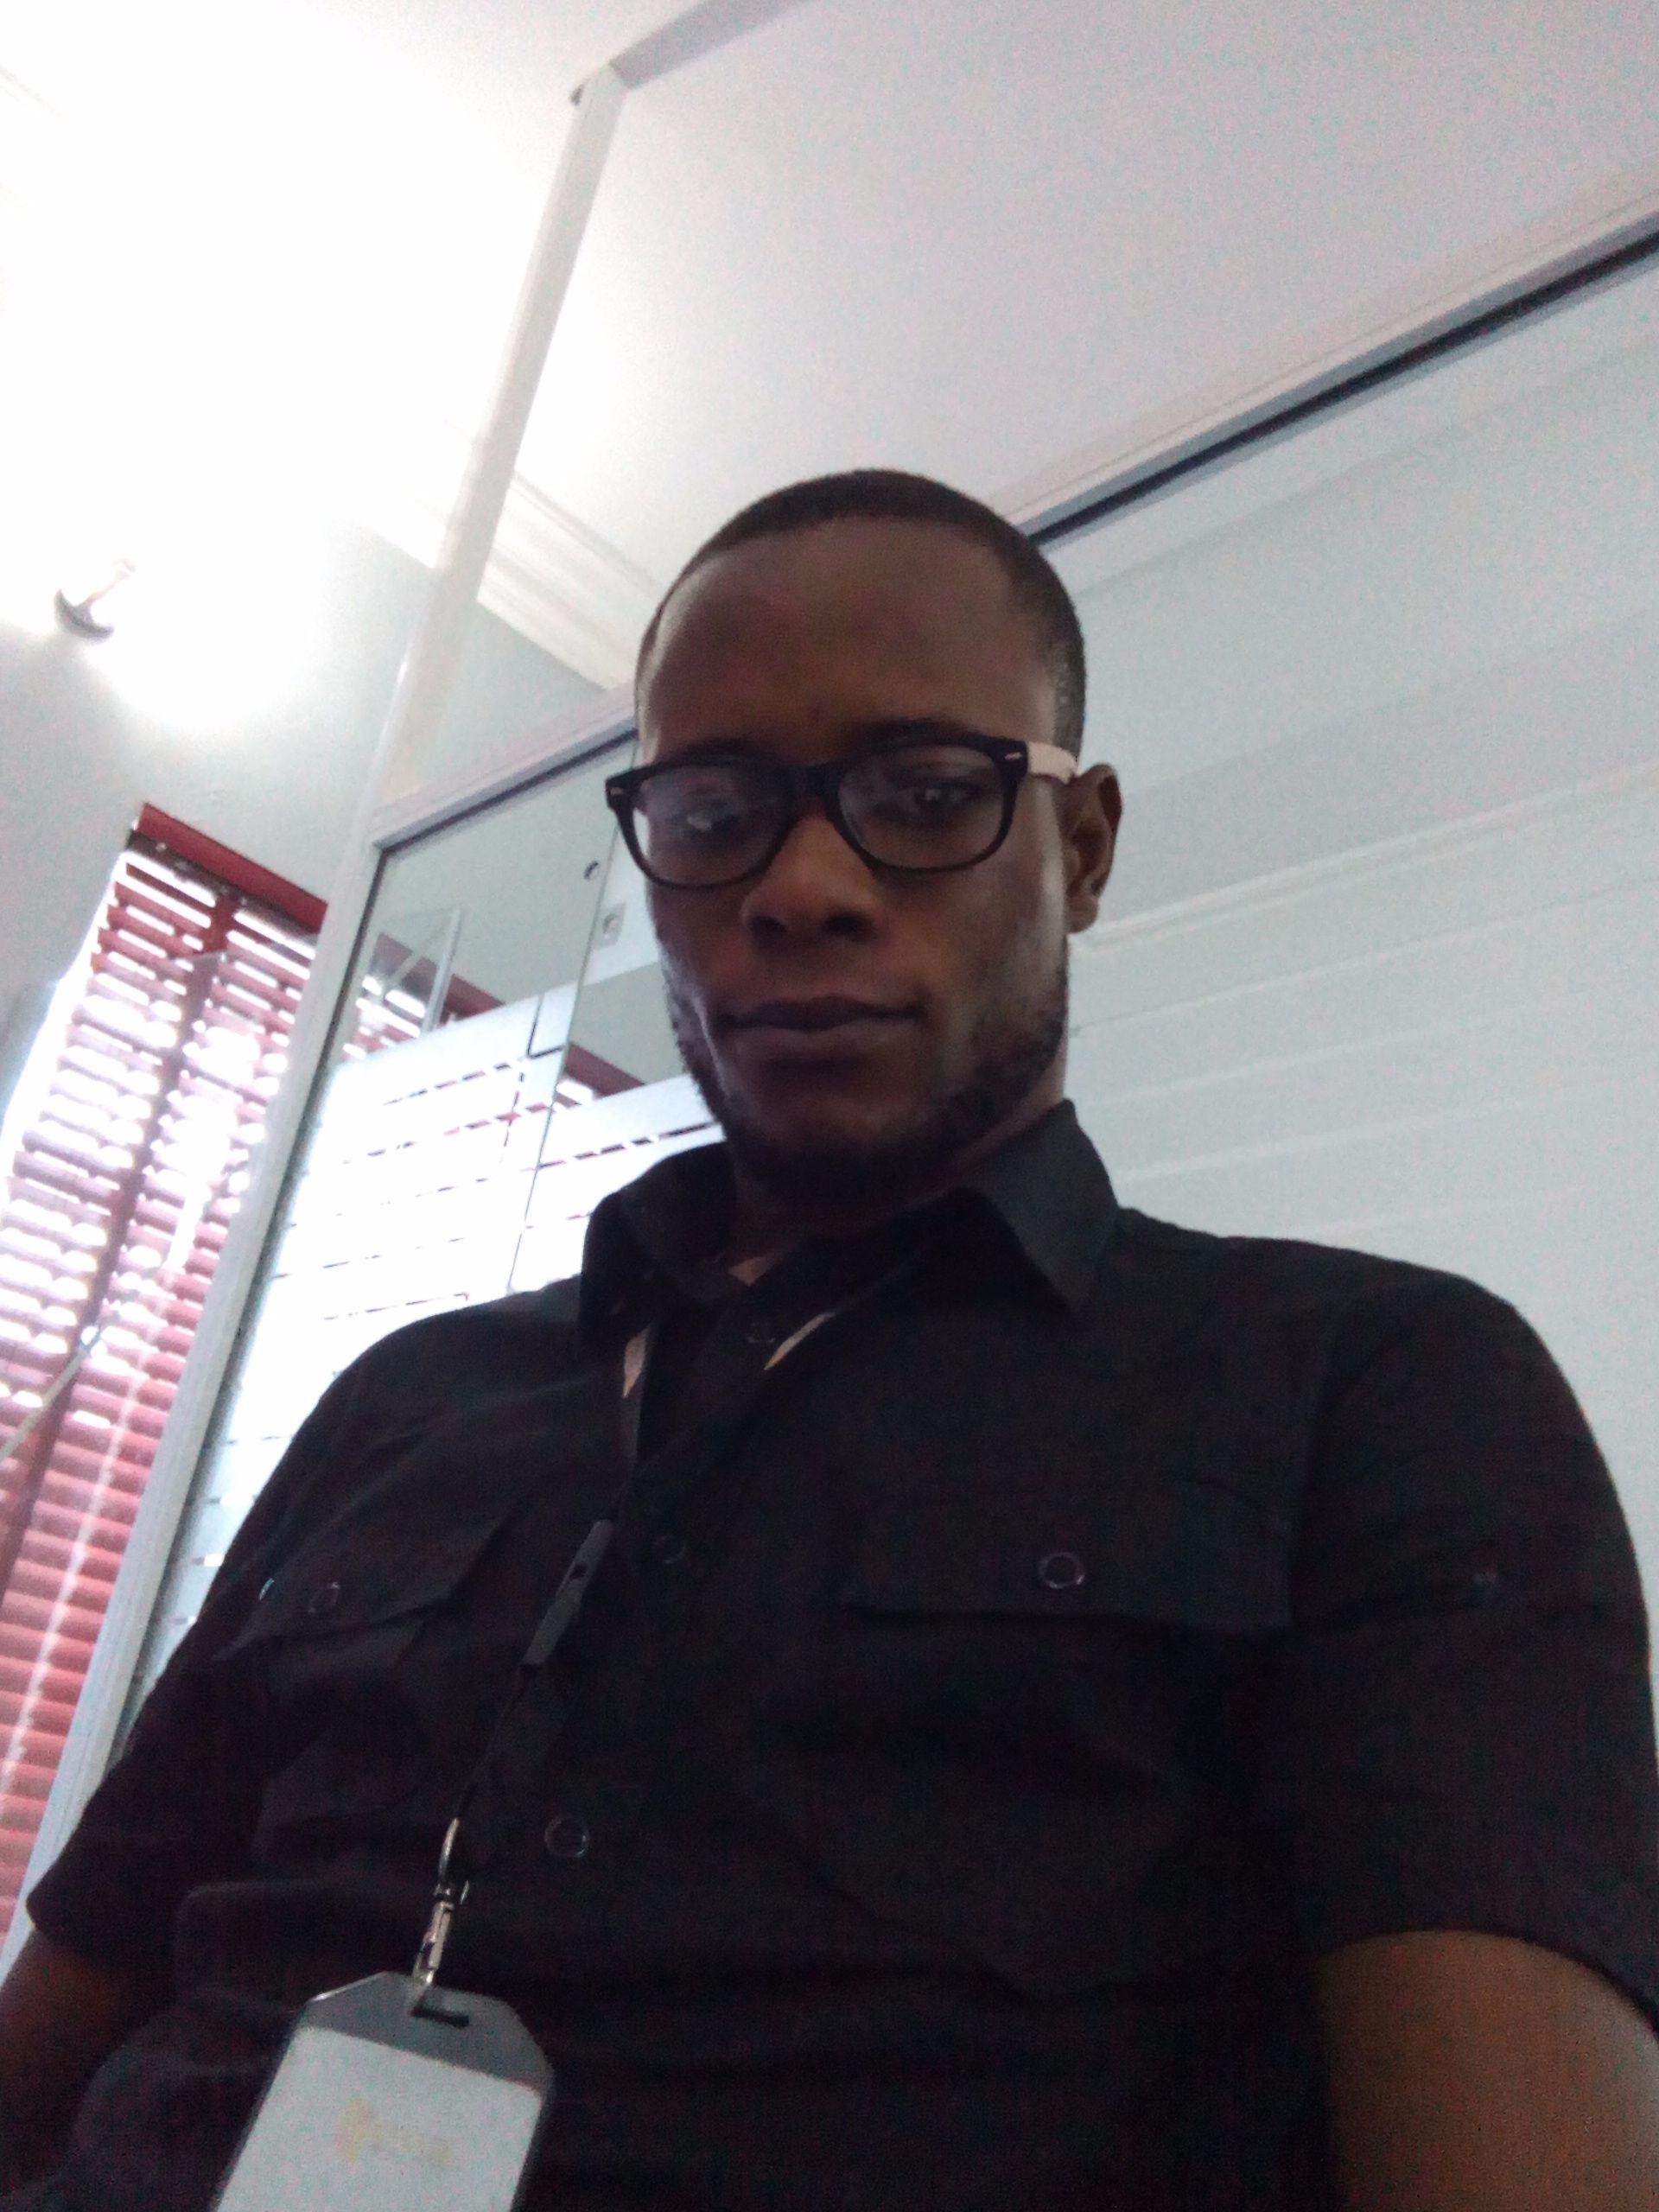 Adonisjs mentor, Adonisjs expert, Adonisjs code help